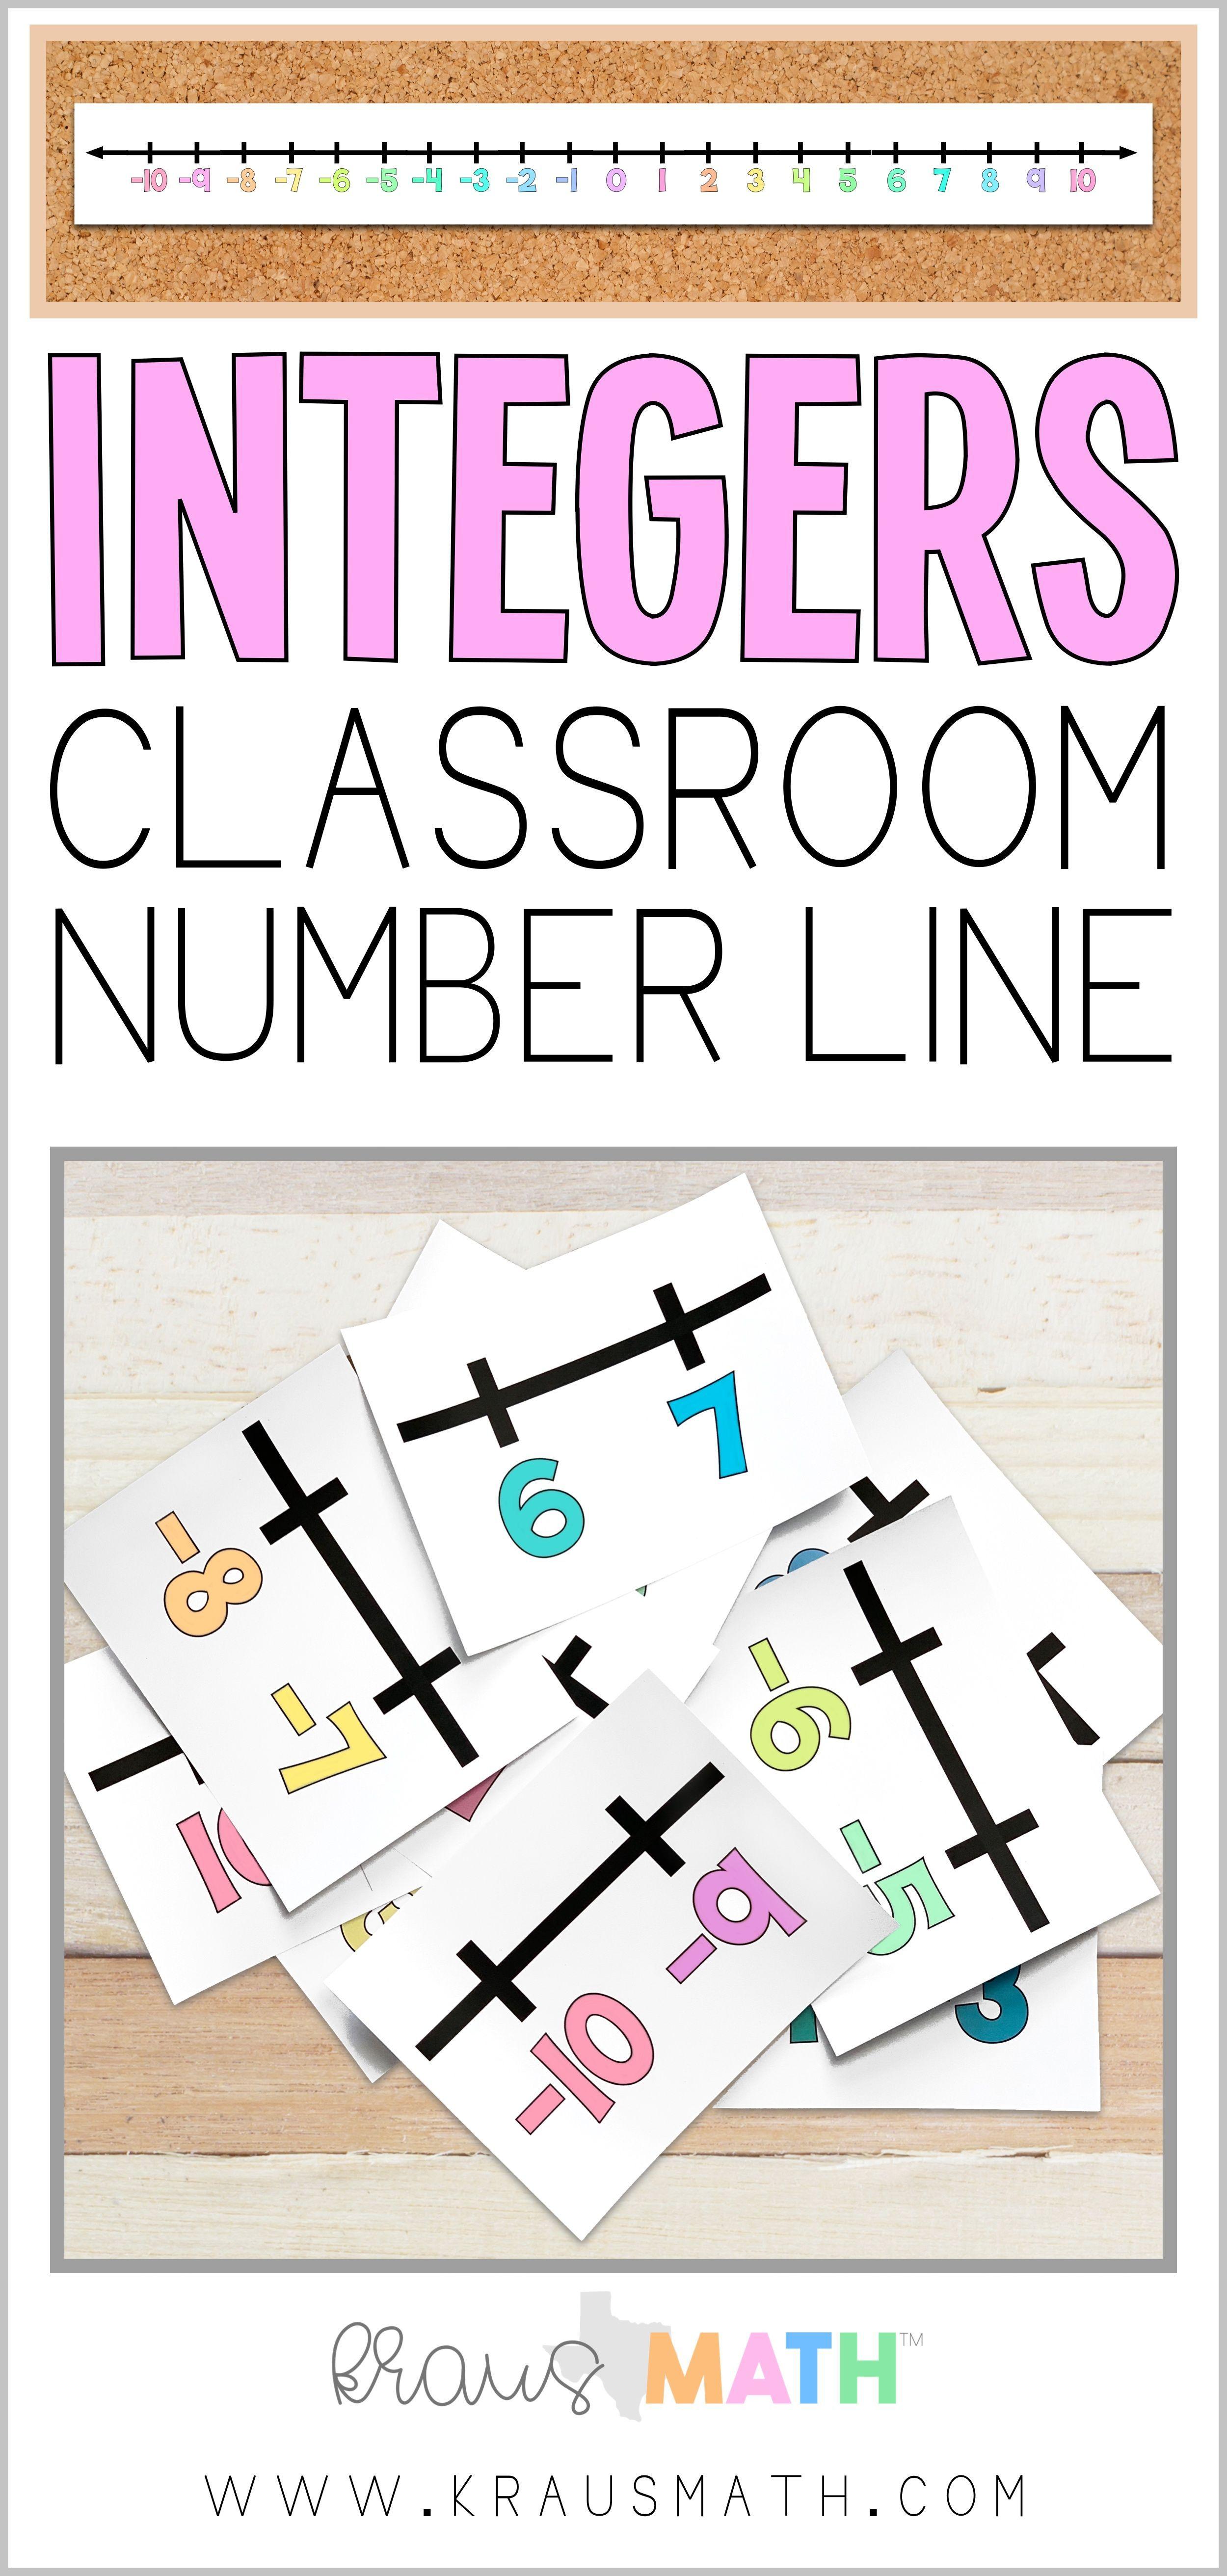 Integers Number Line Large Bulletin Board Size